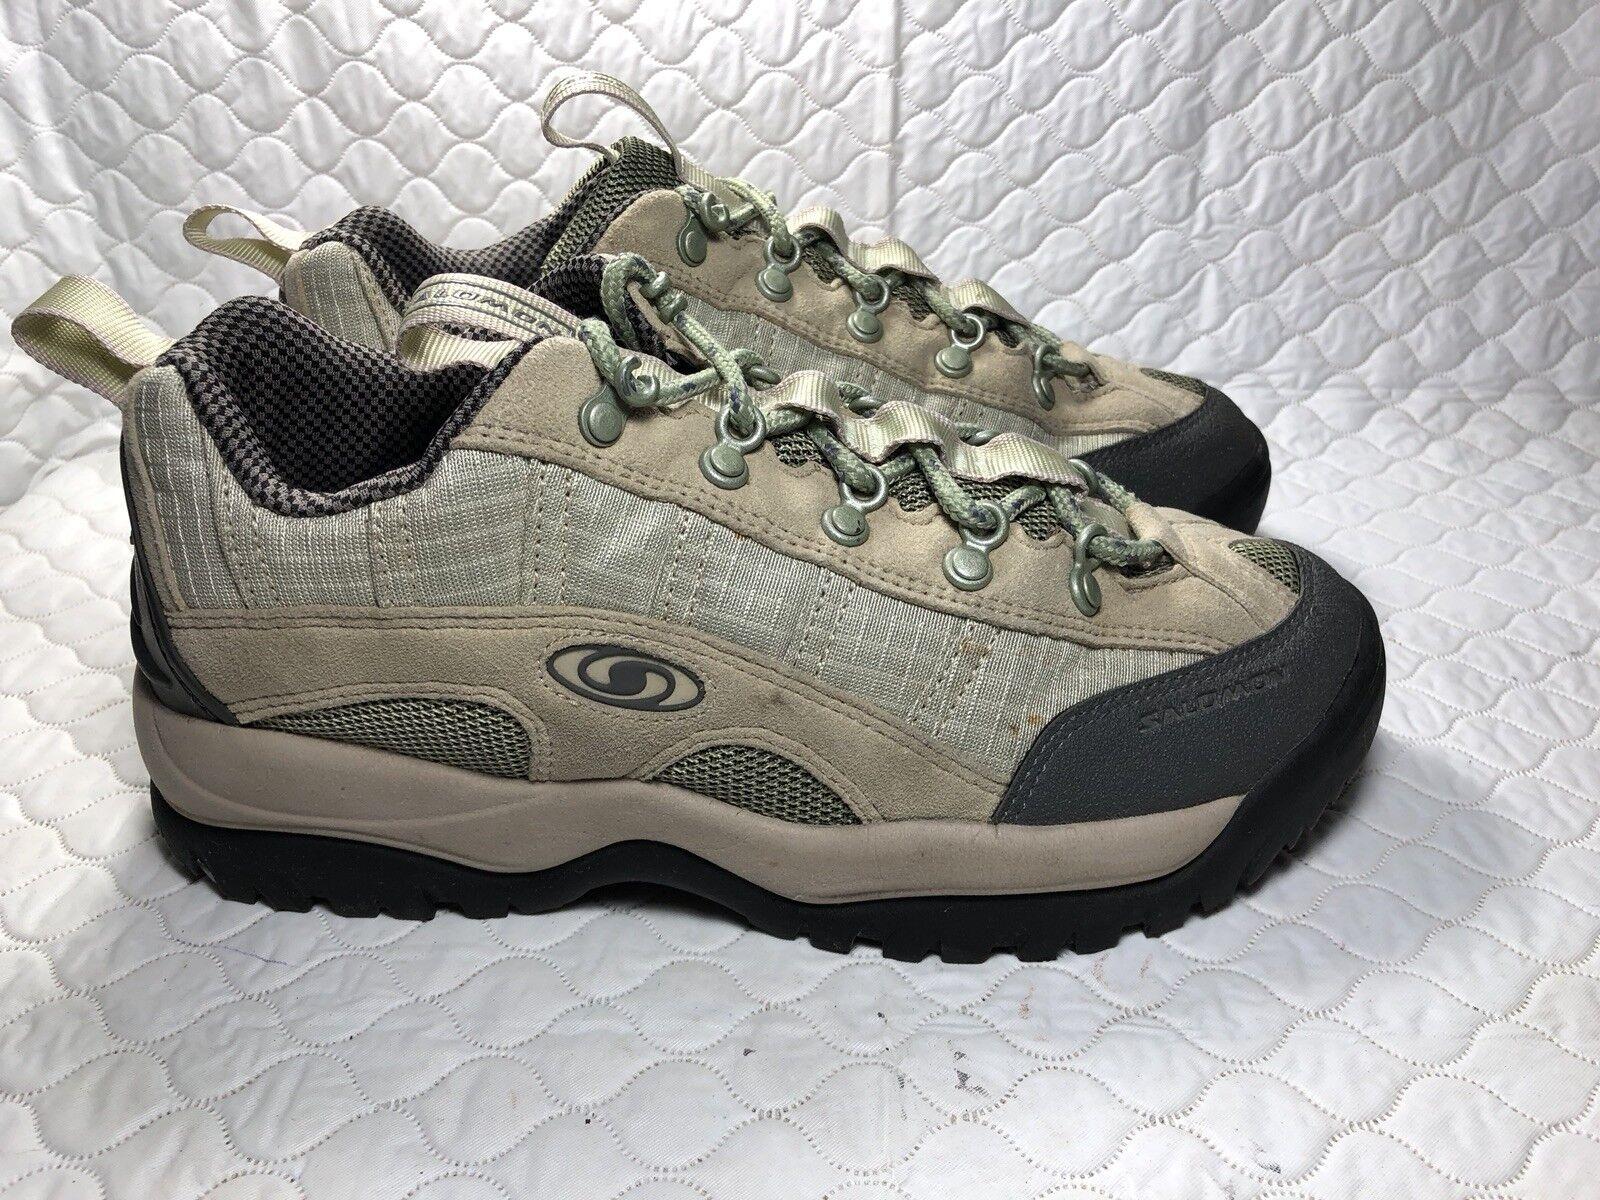 Salomon Women's Hiking Trail shoes Conta Grip Size-8